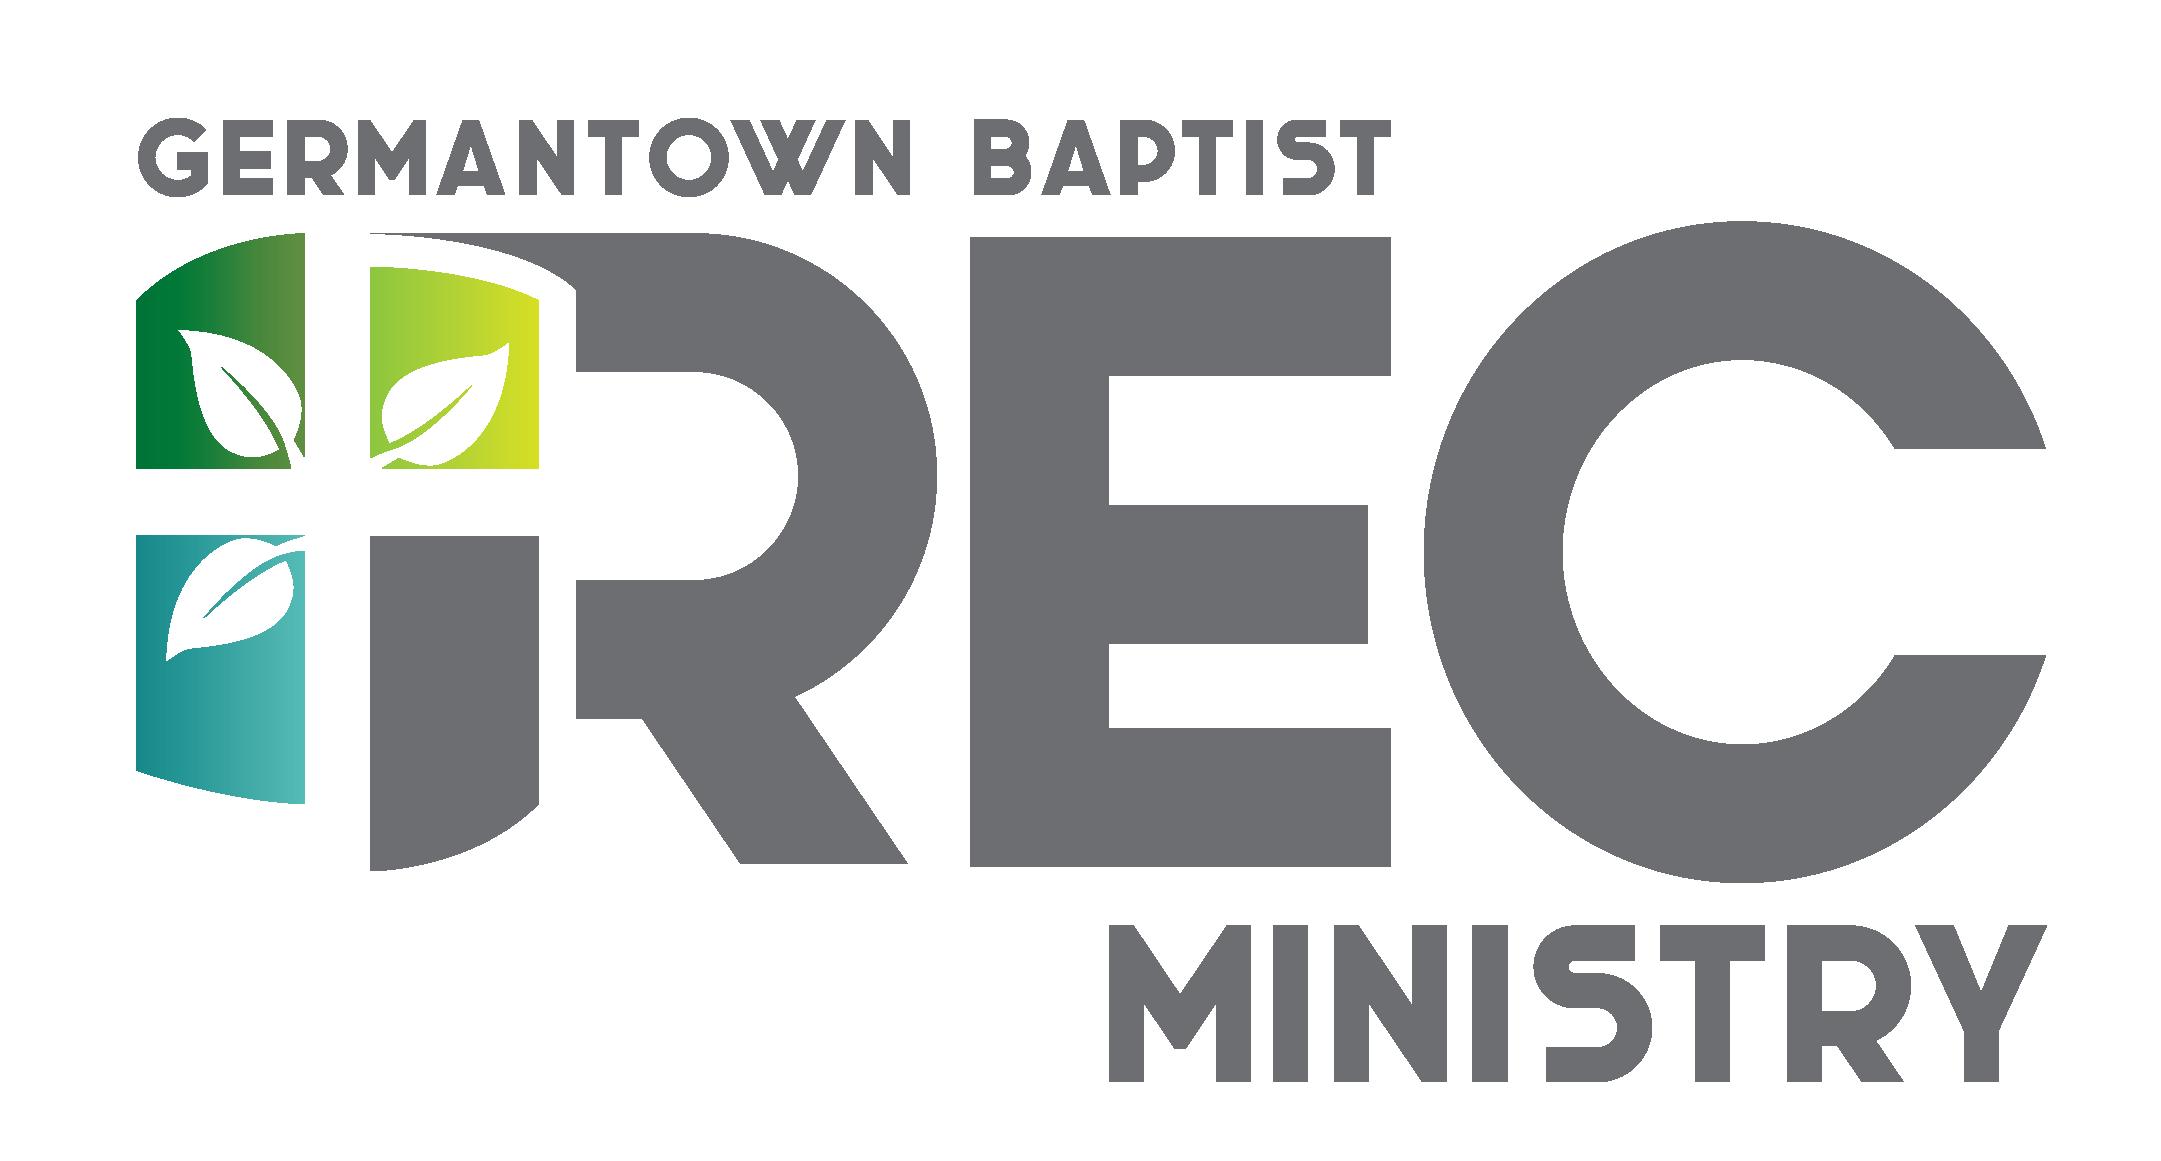 GBC_REC_logo.png